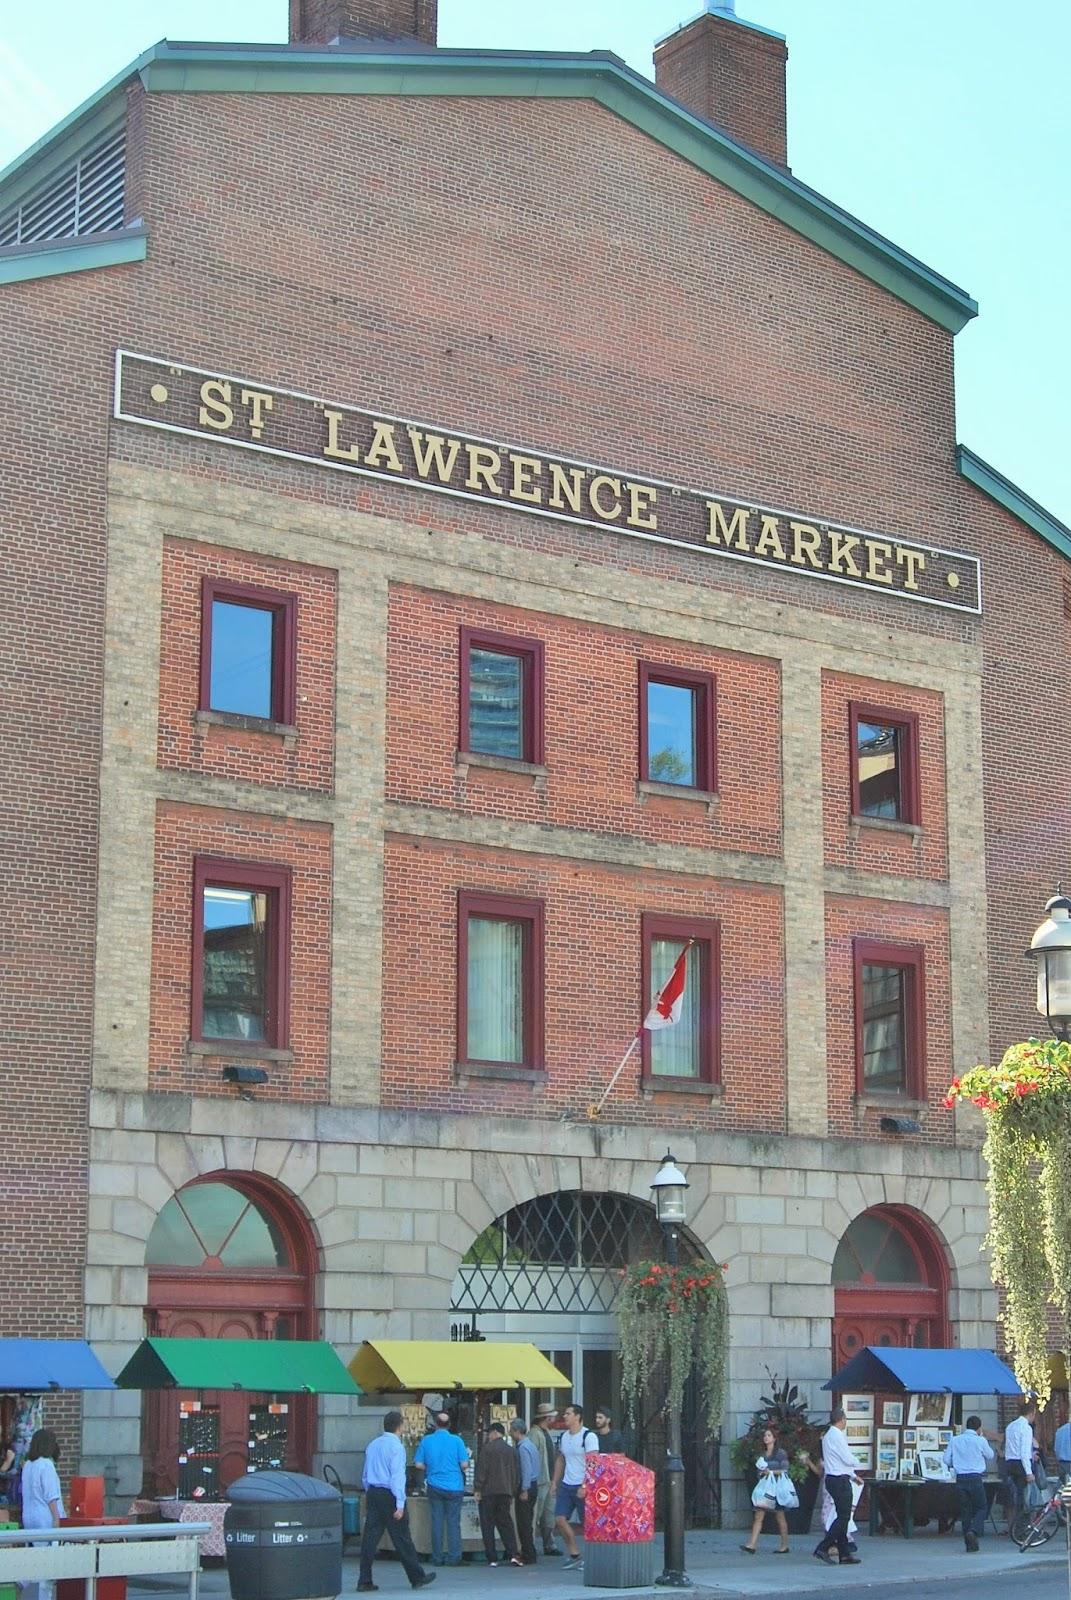 St Lawrence Market, Toronto, Canada photo by Modern Bric a Brac